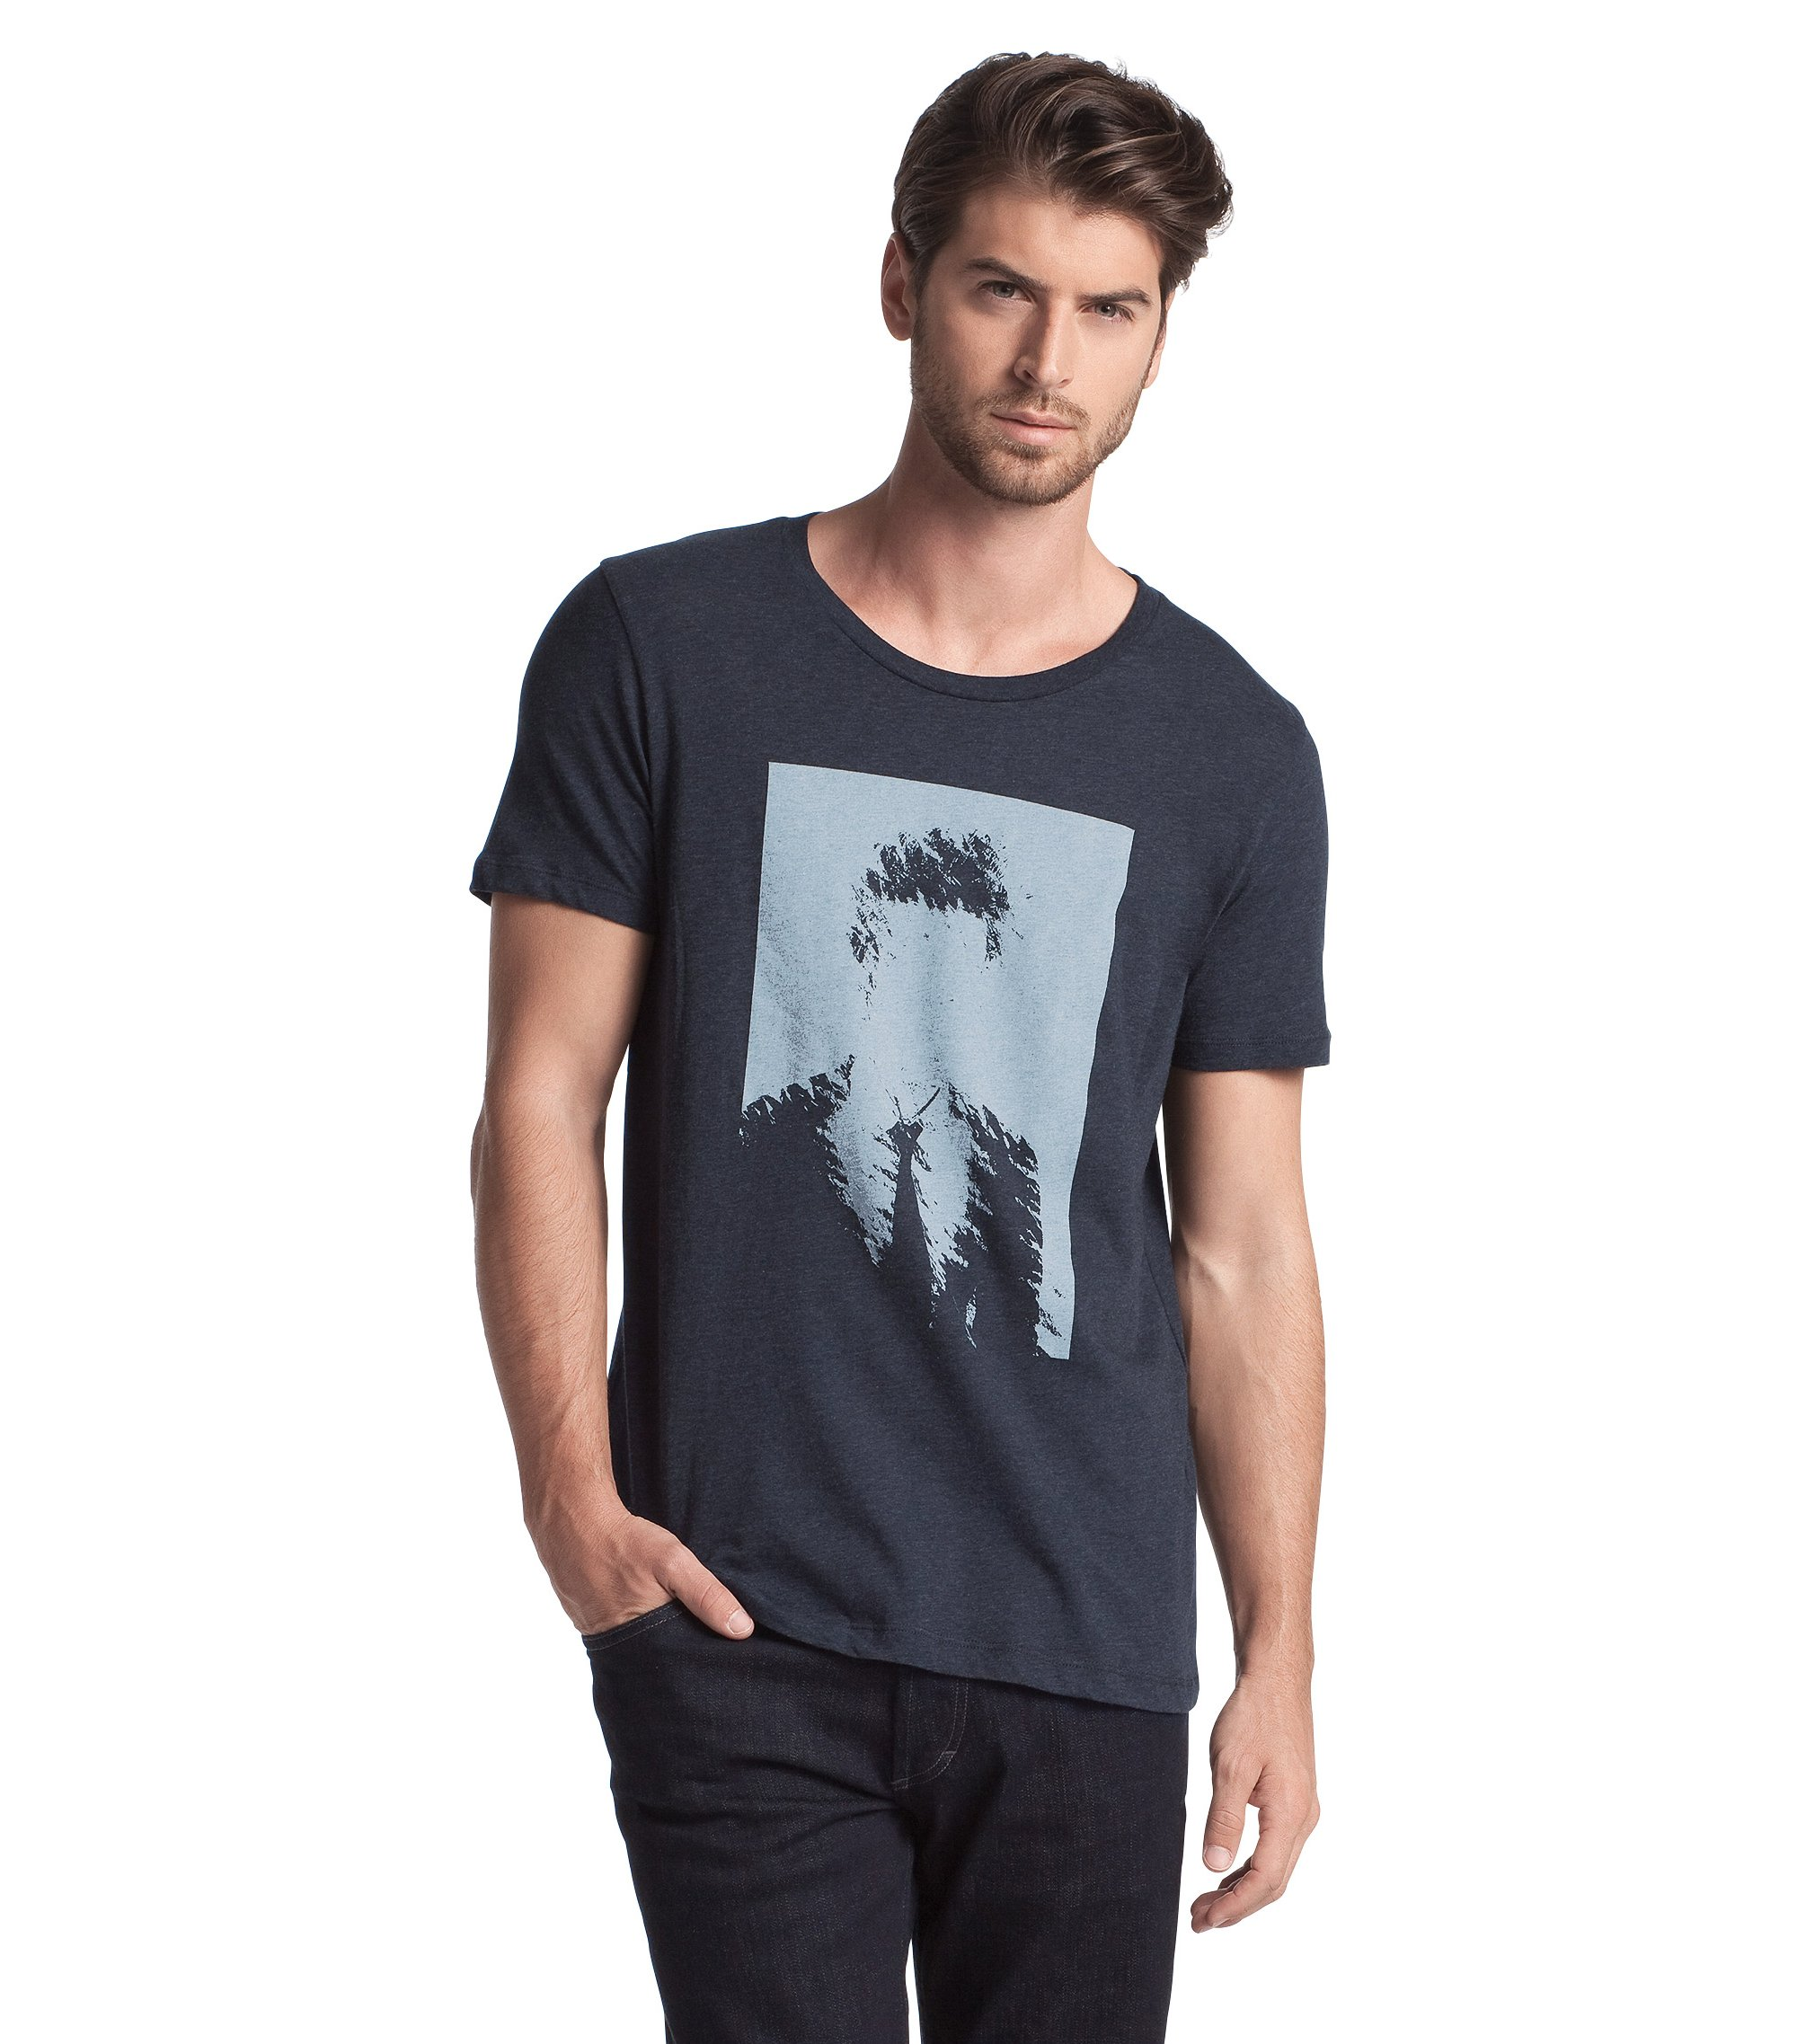 Crew neck T-Shirt ´Dames`, Open Grey